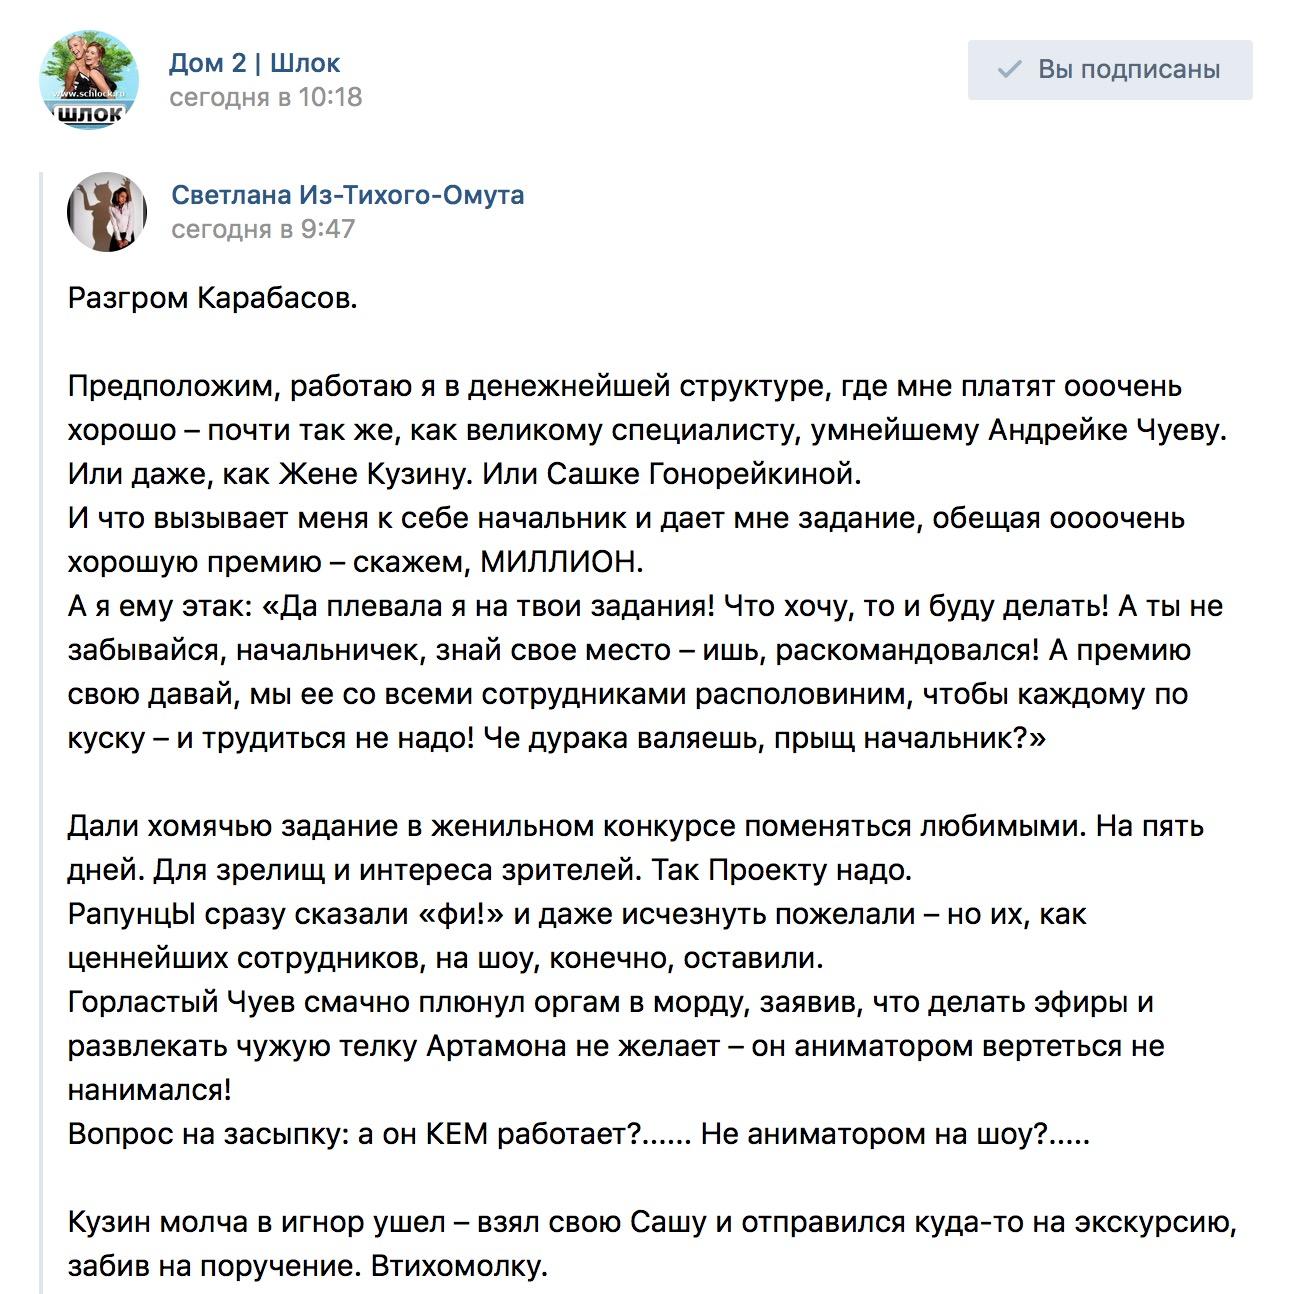 Разгром Карабасов